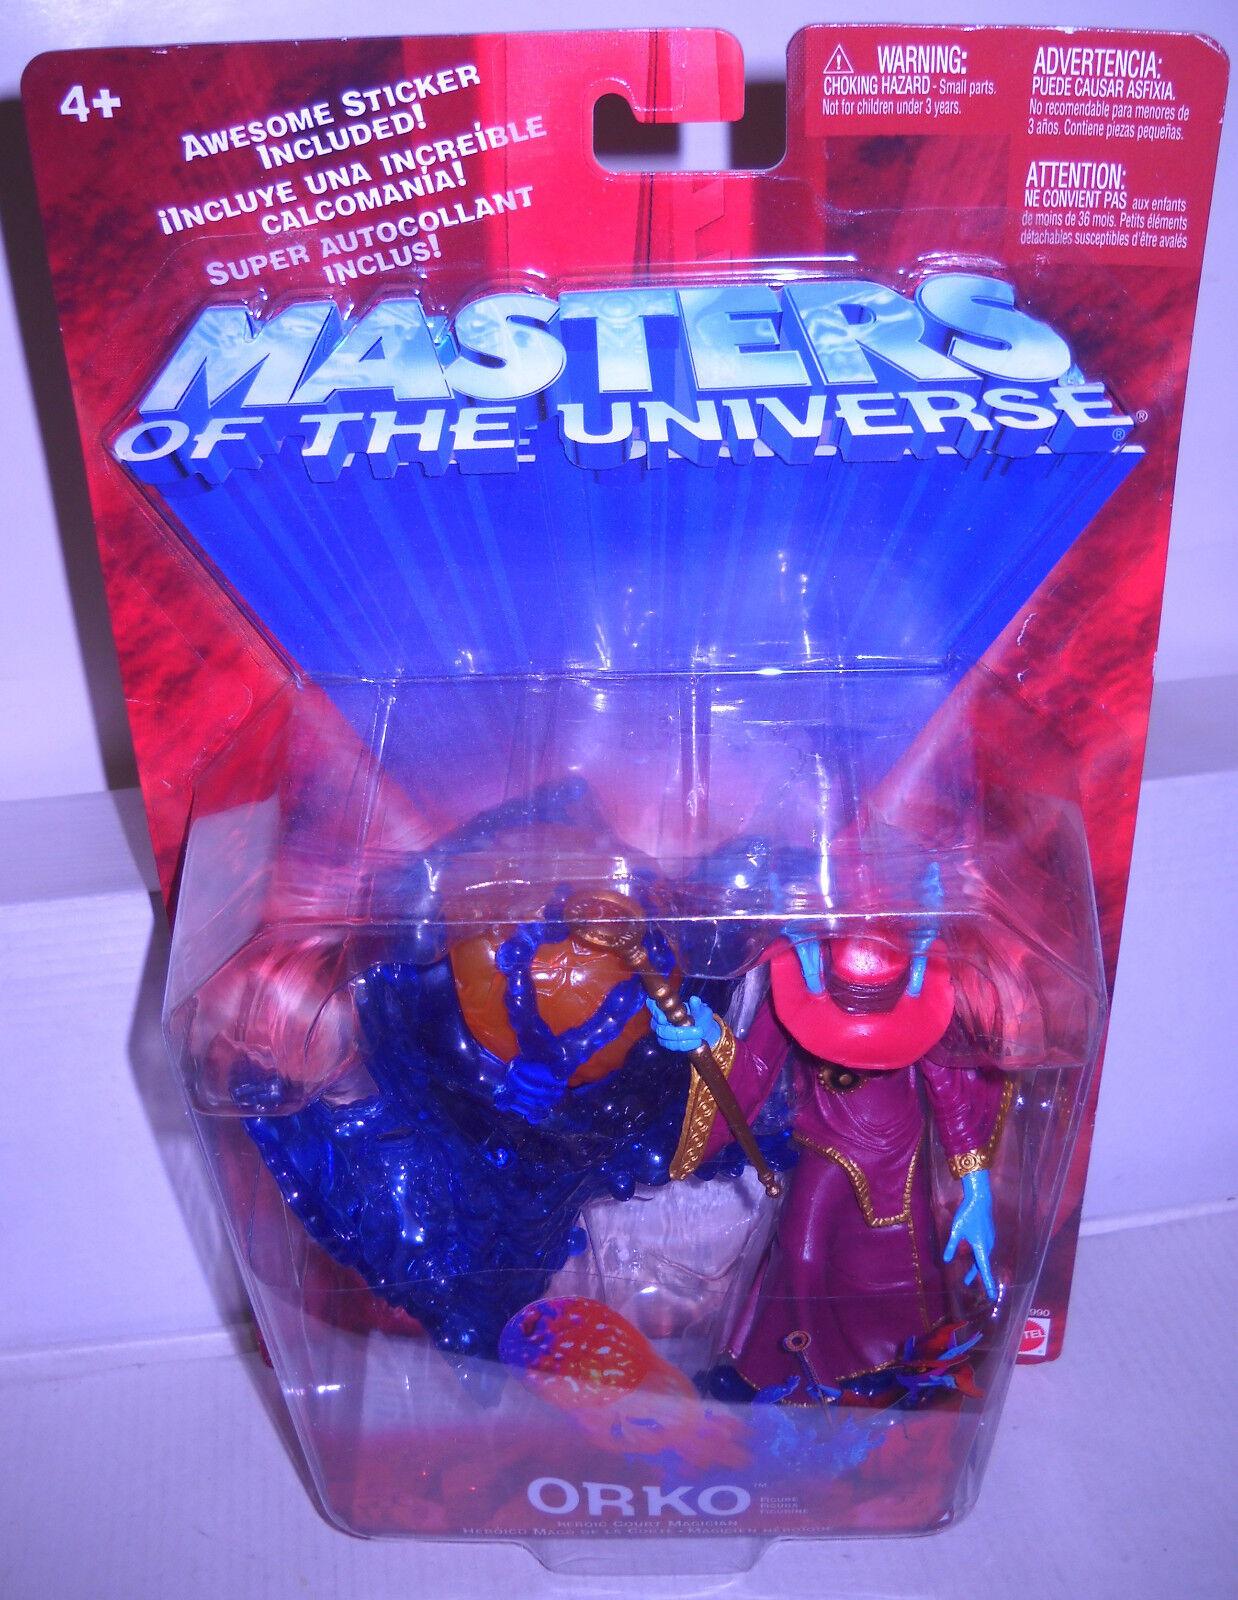 NRFC Mattel Masters of the Universe Orko Action Figure